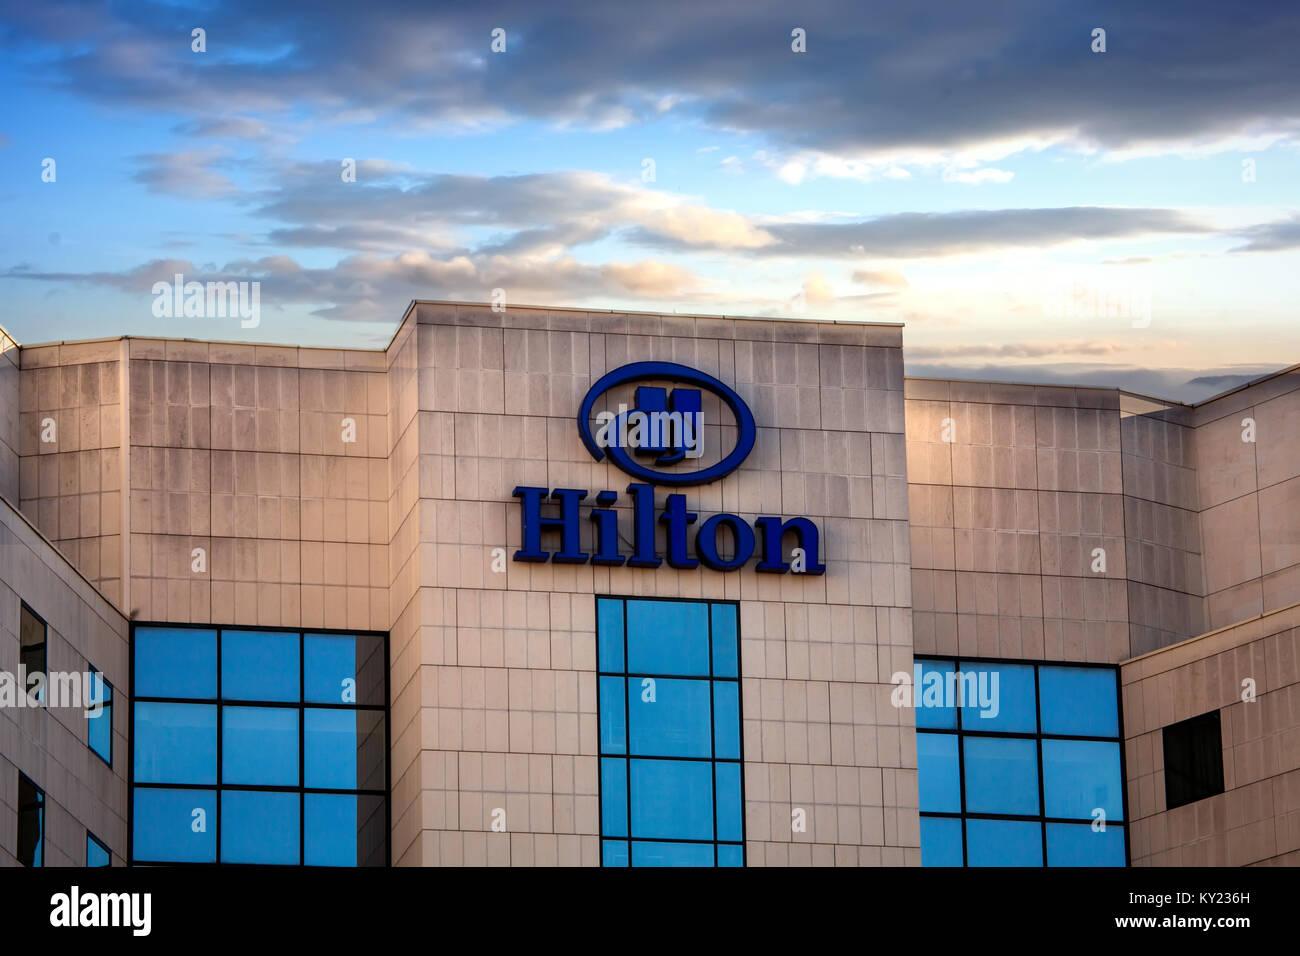 Sofia Bulgaria November 02 2017 Hilton Hotels And Resorts Logo